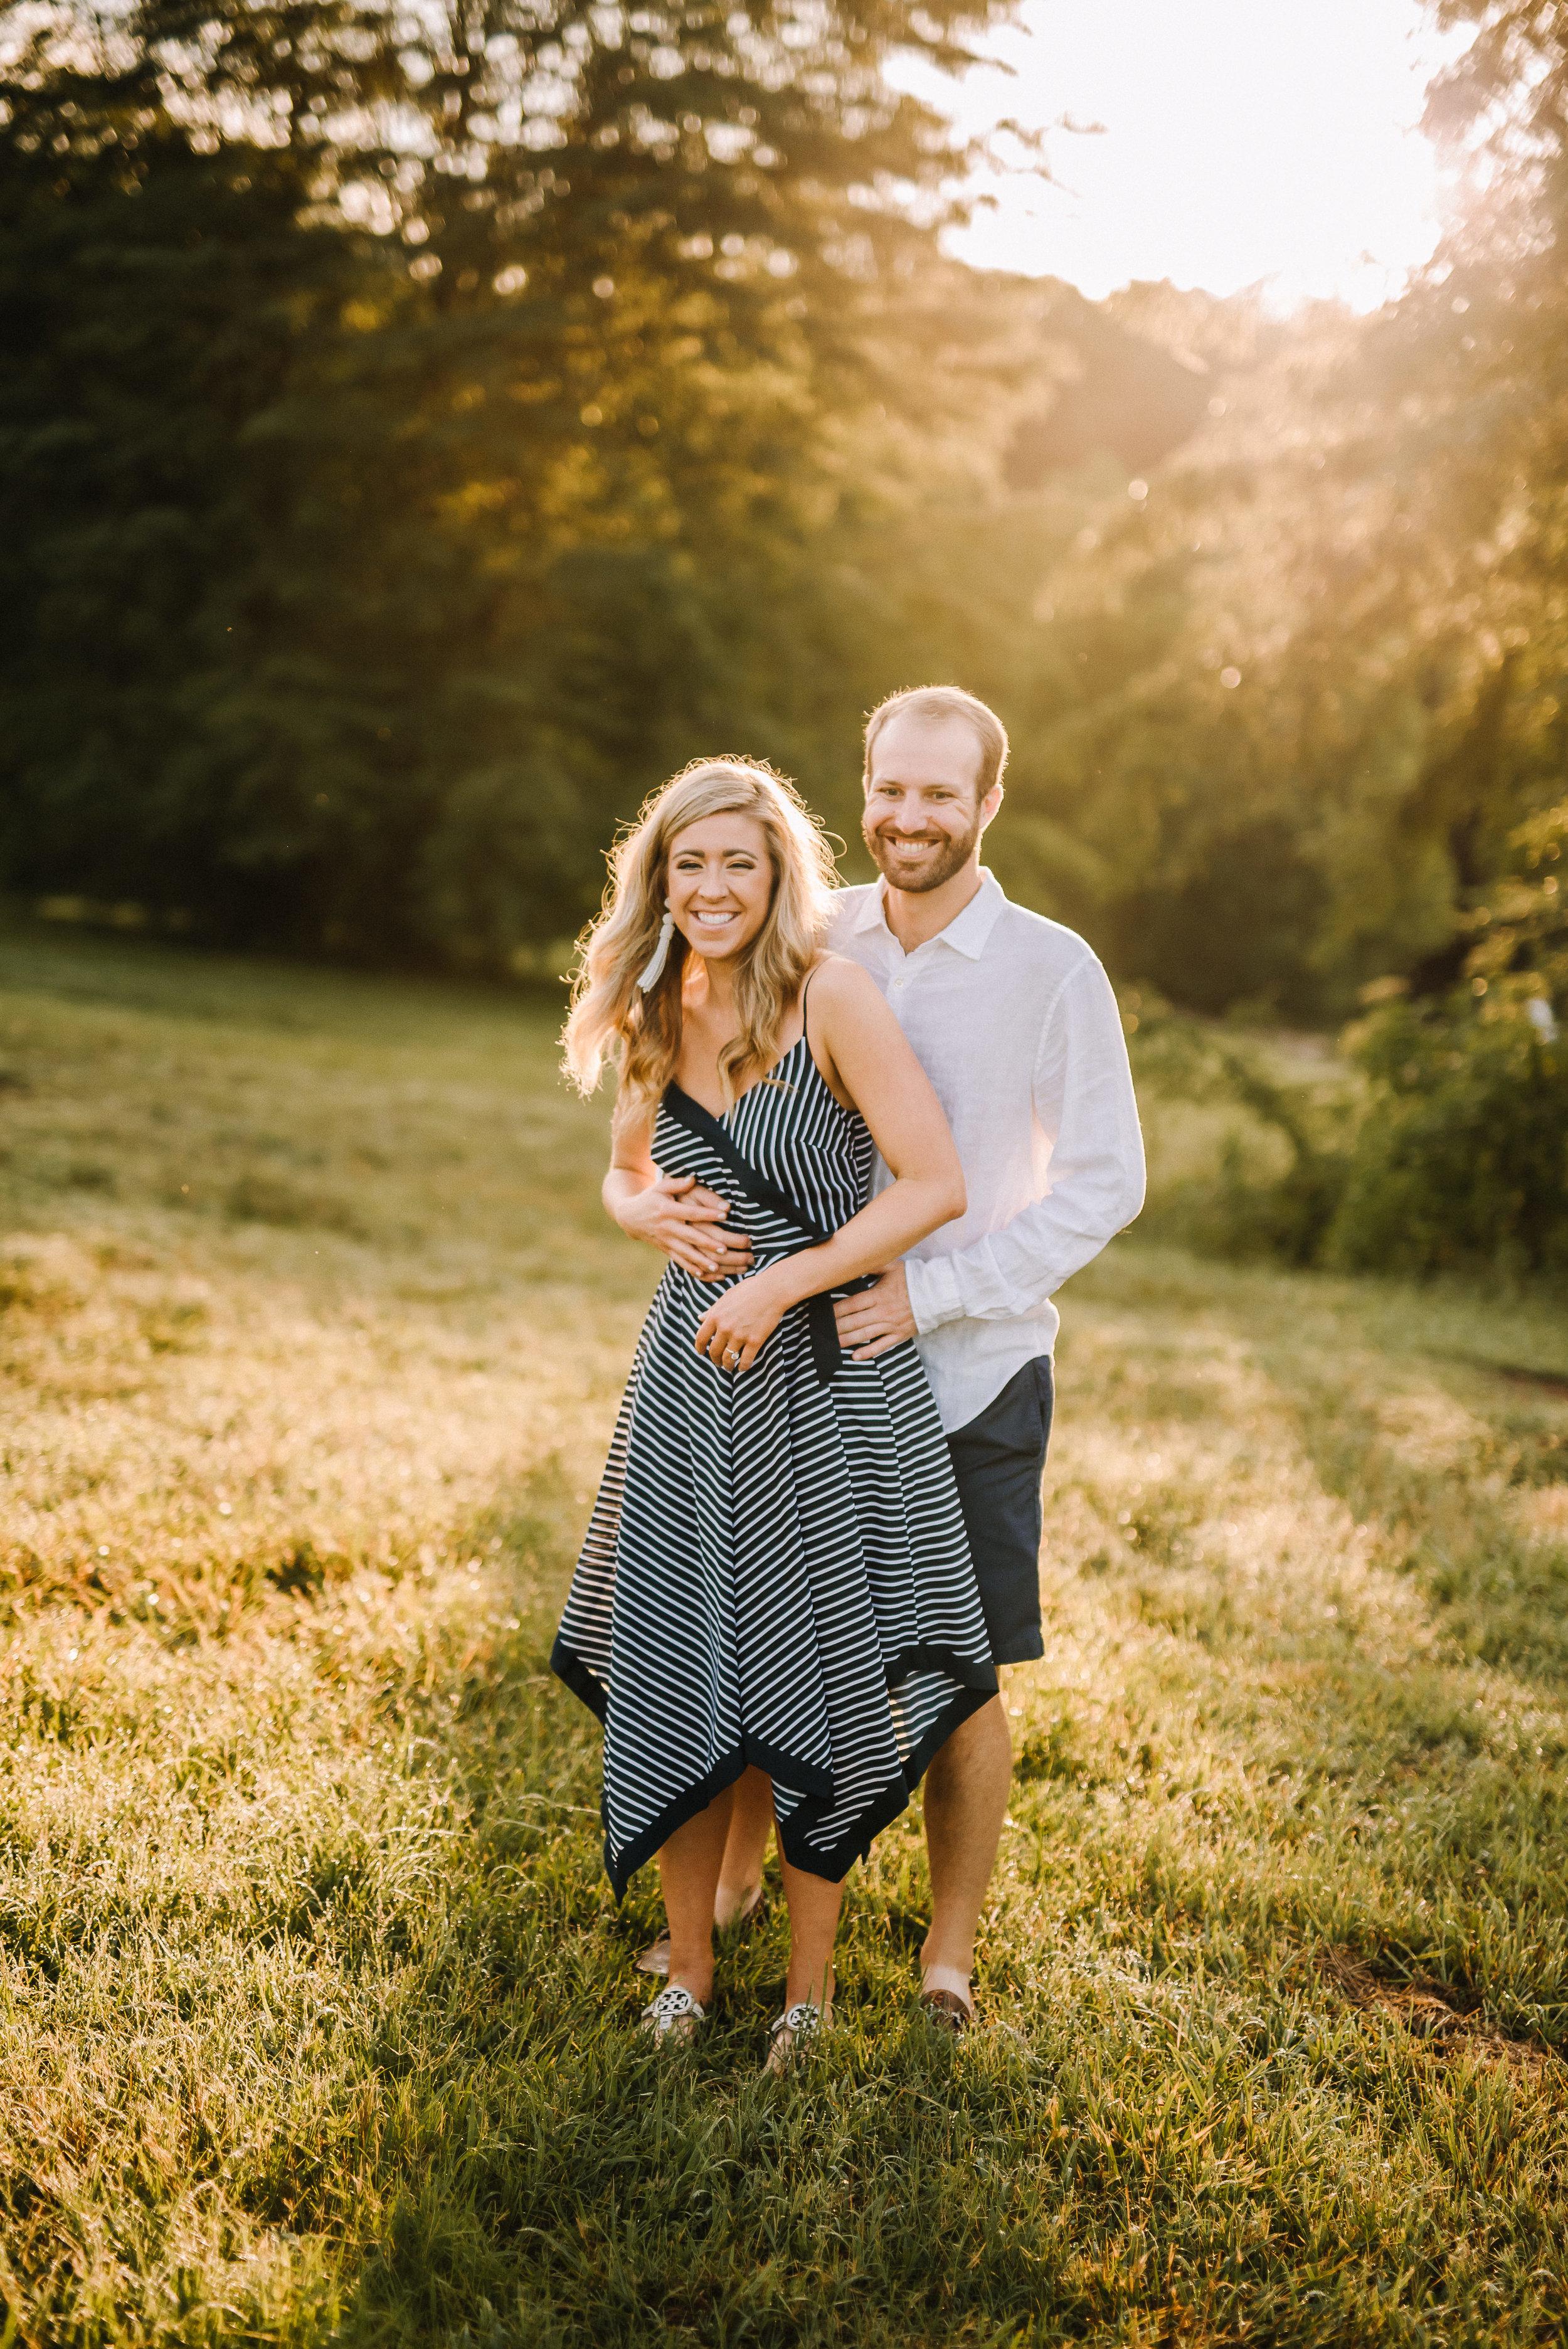 Meredith & Michael_Broad Ave_Shelby Farms_Ashley Benham Photography-102.jpg